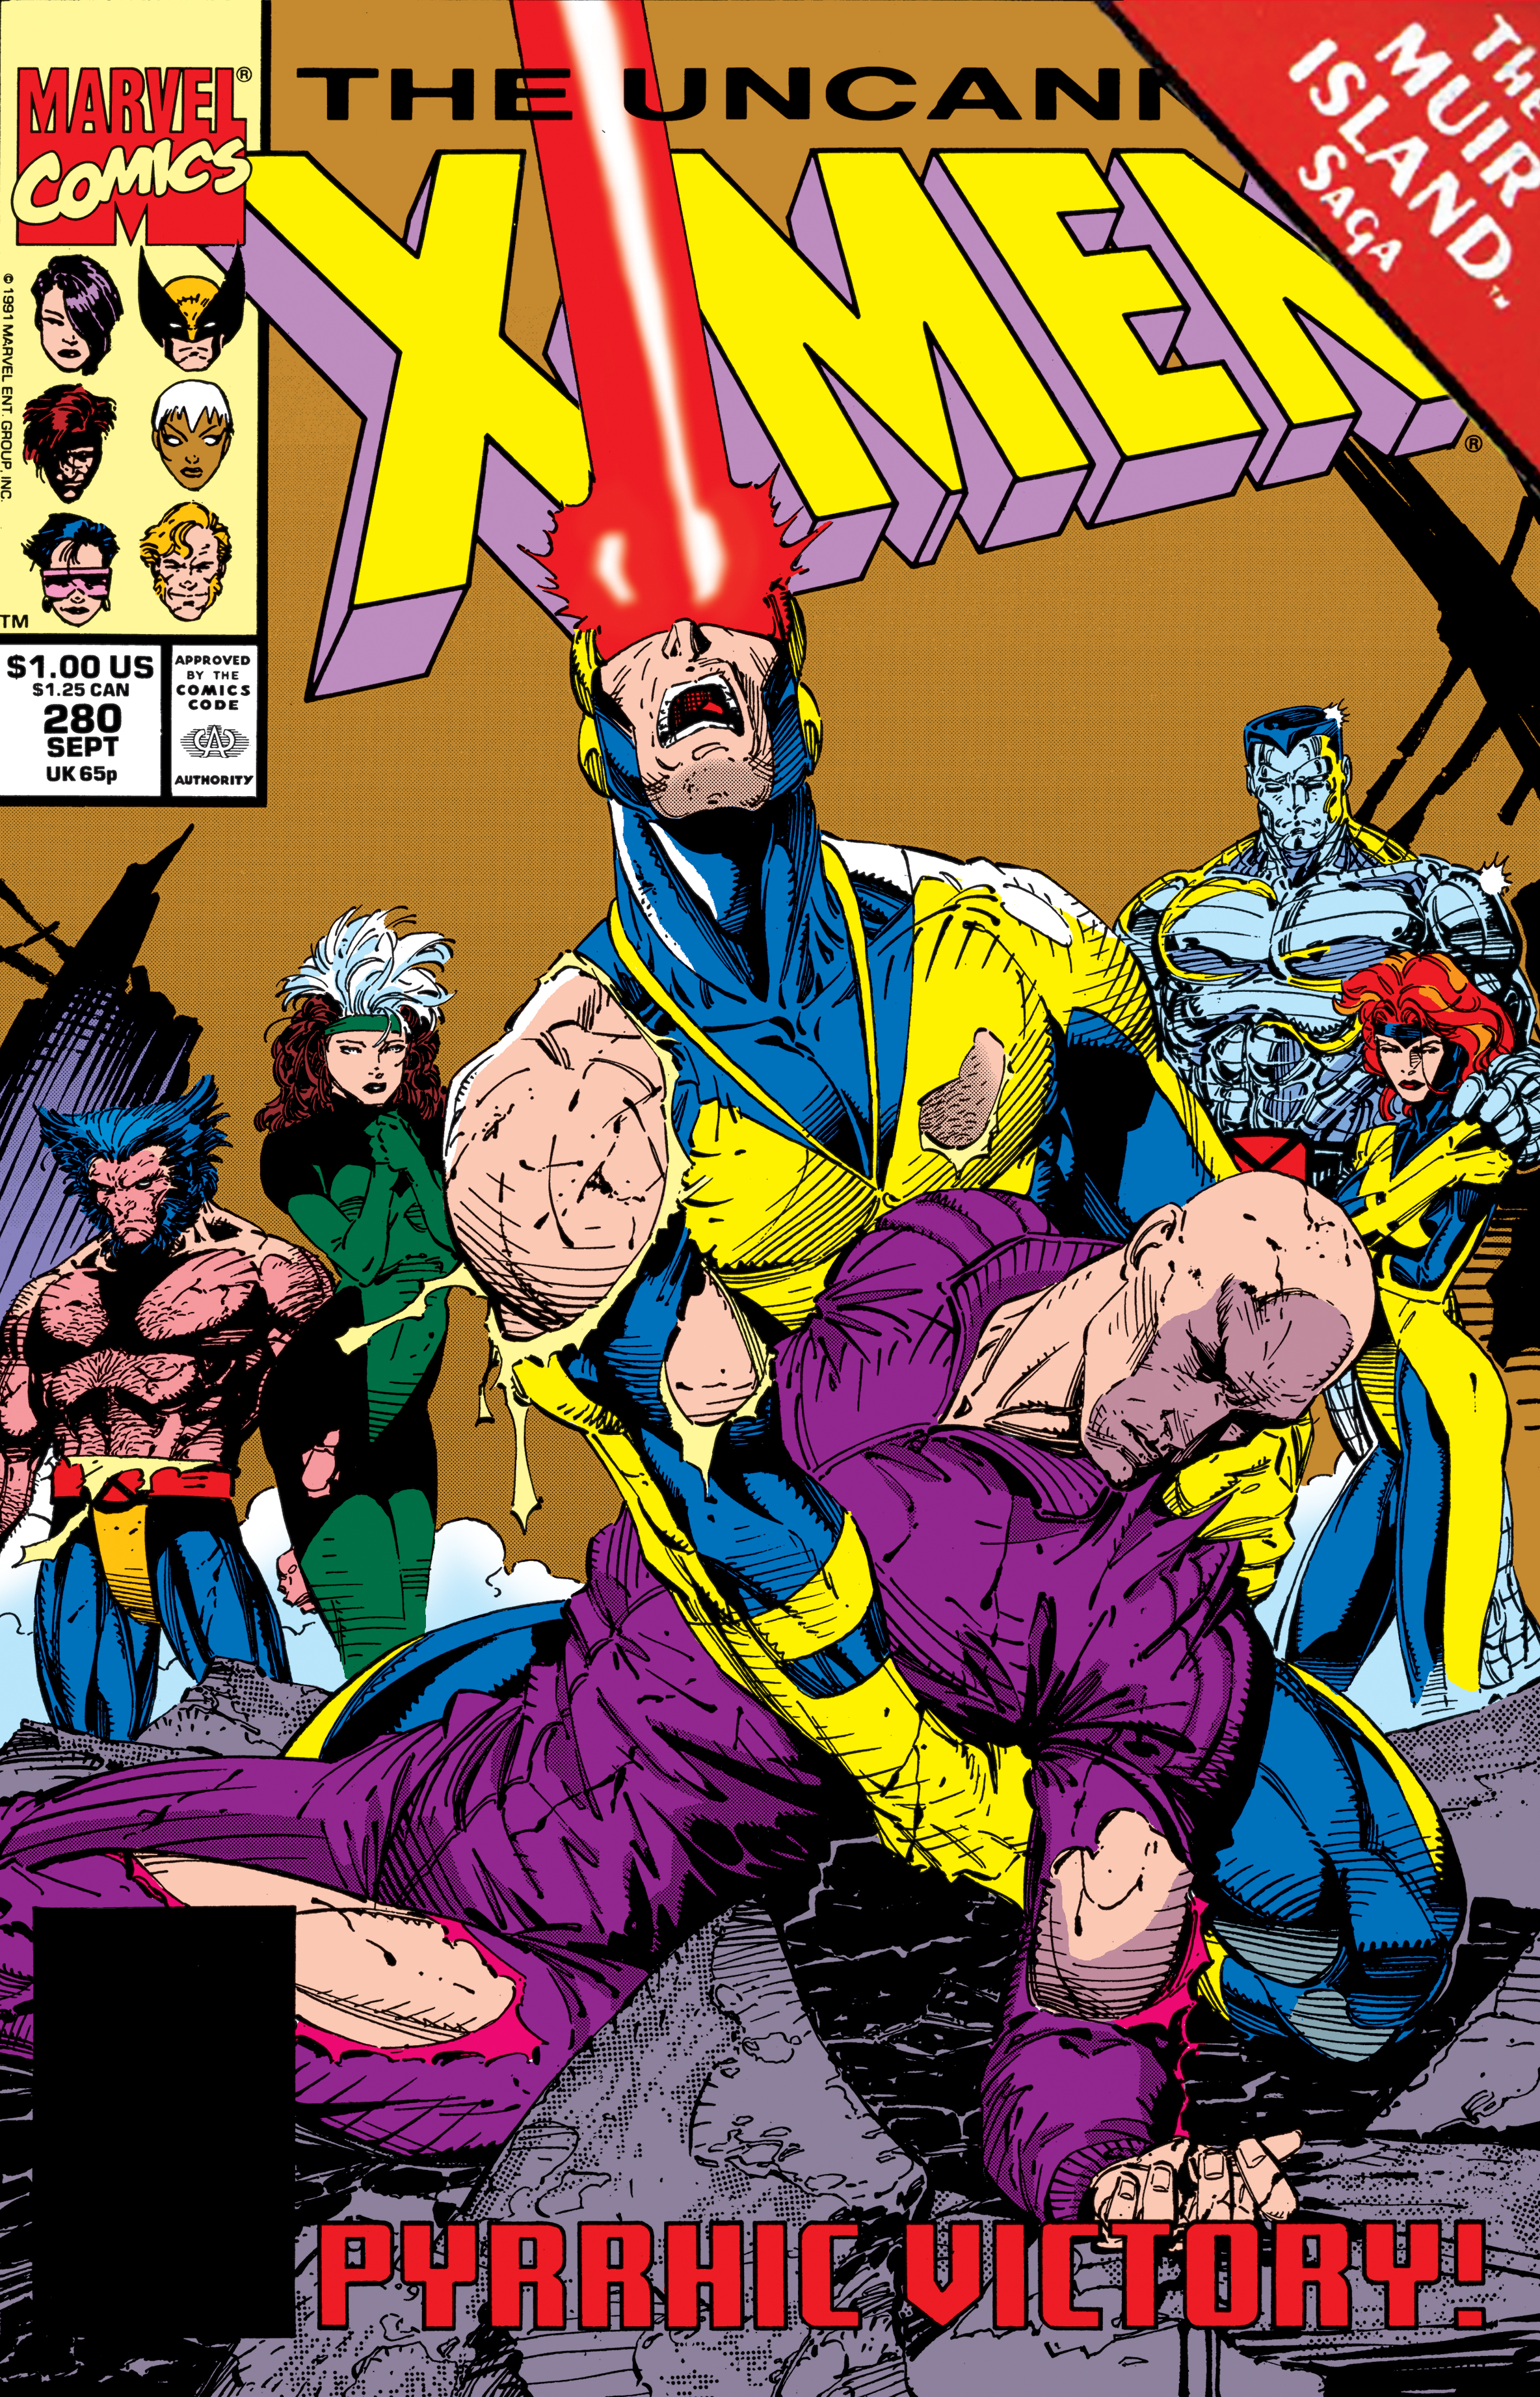 Uncanny X-Men (1963) #280